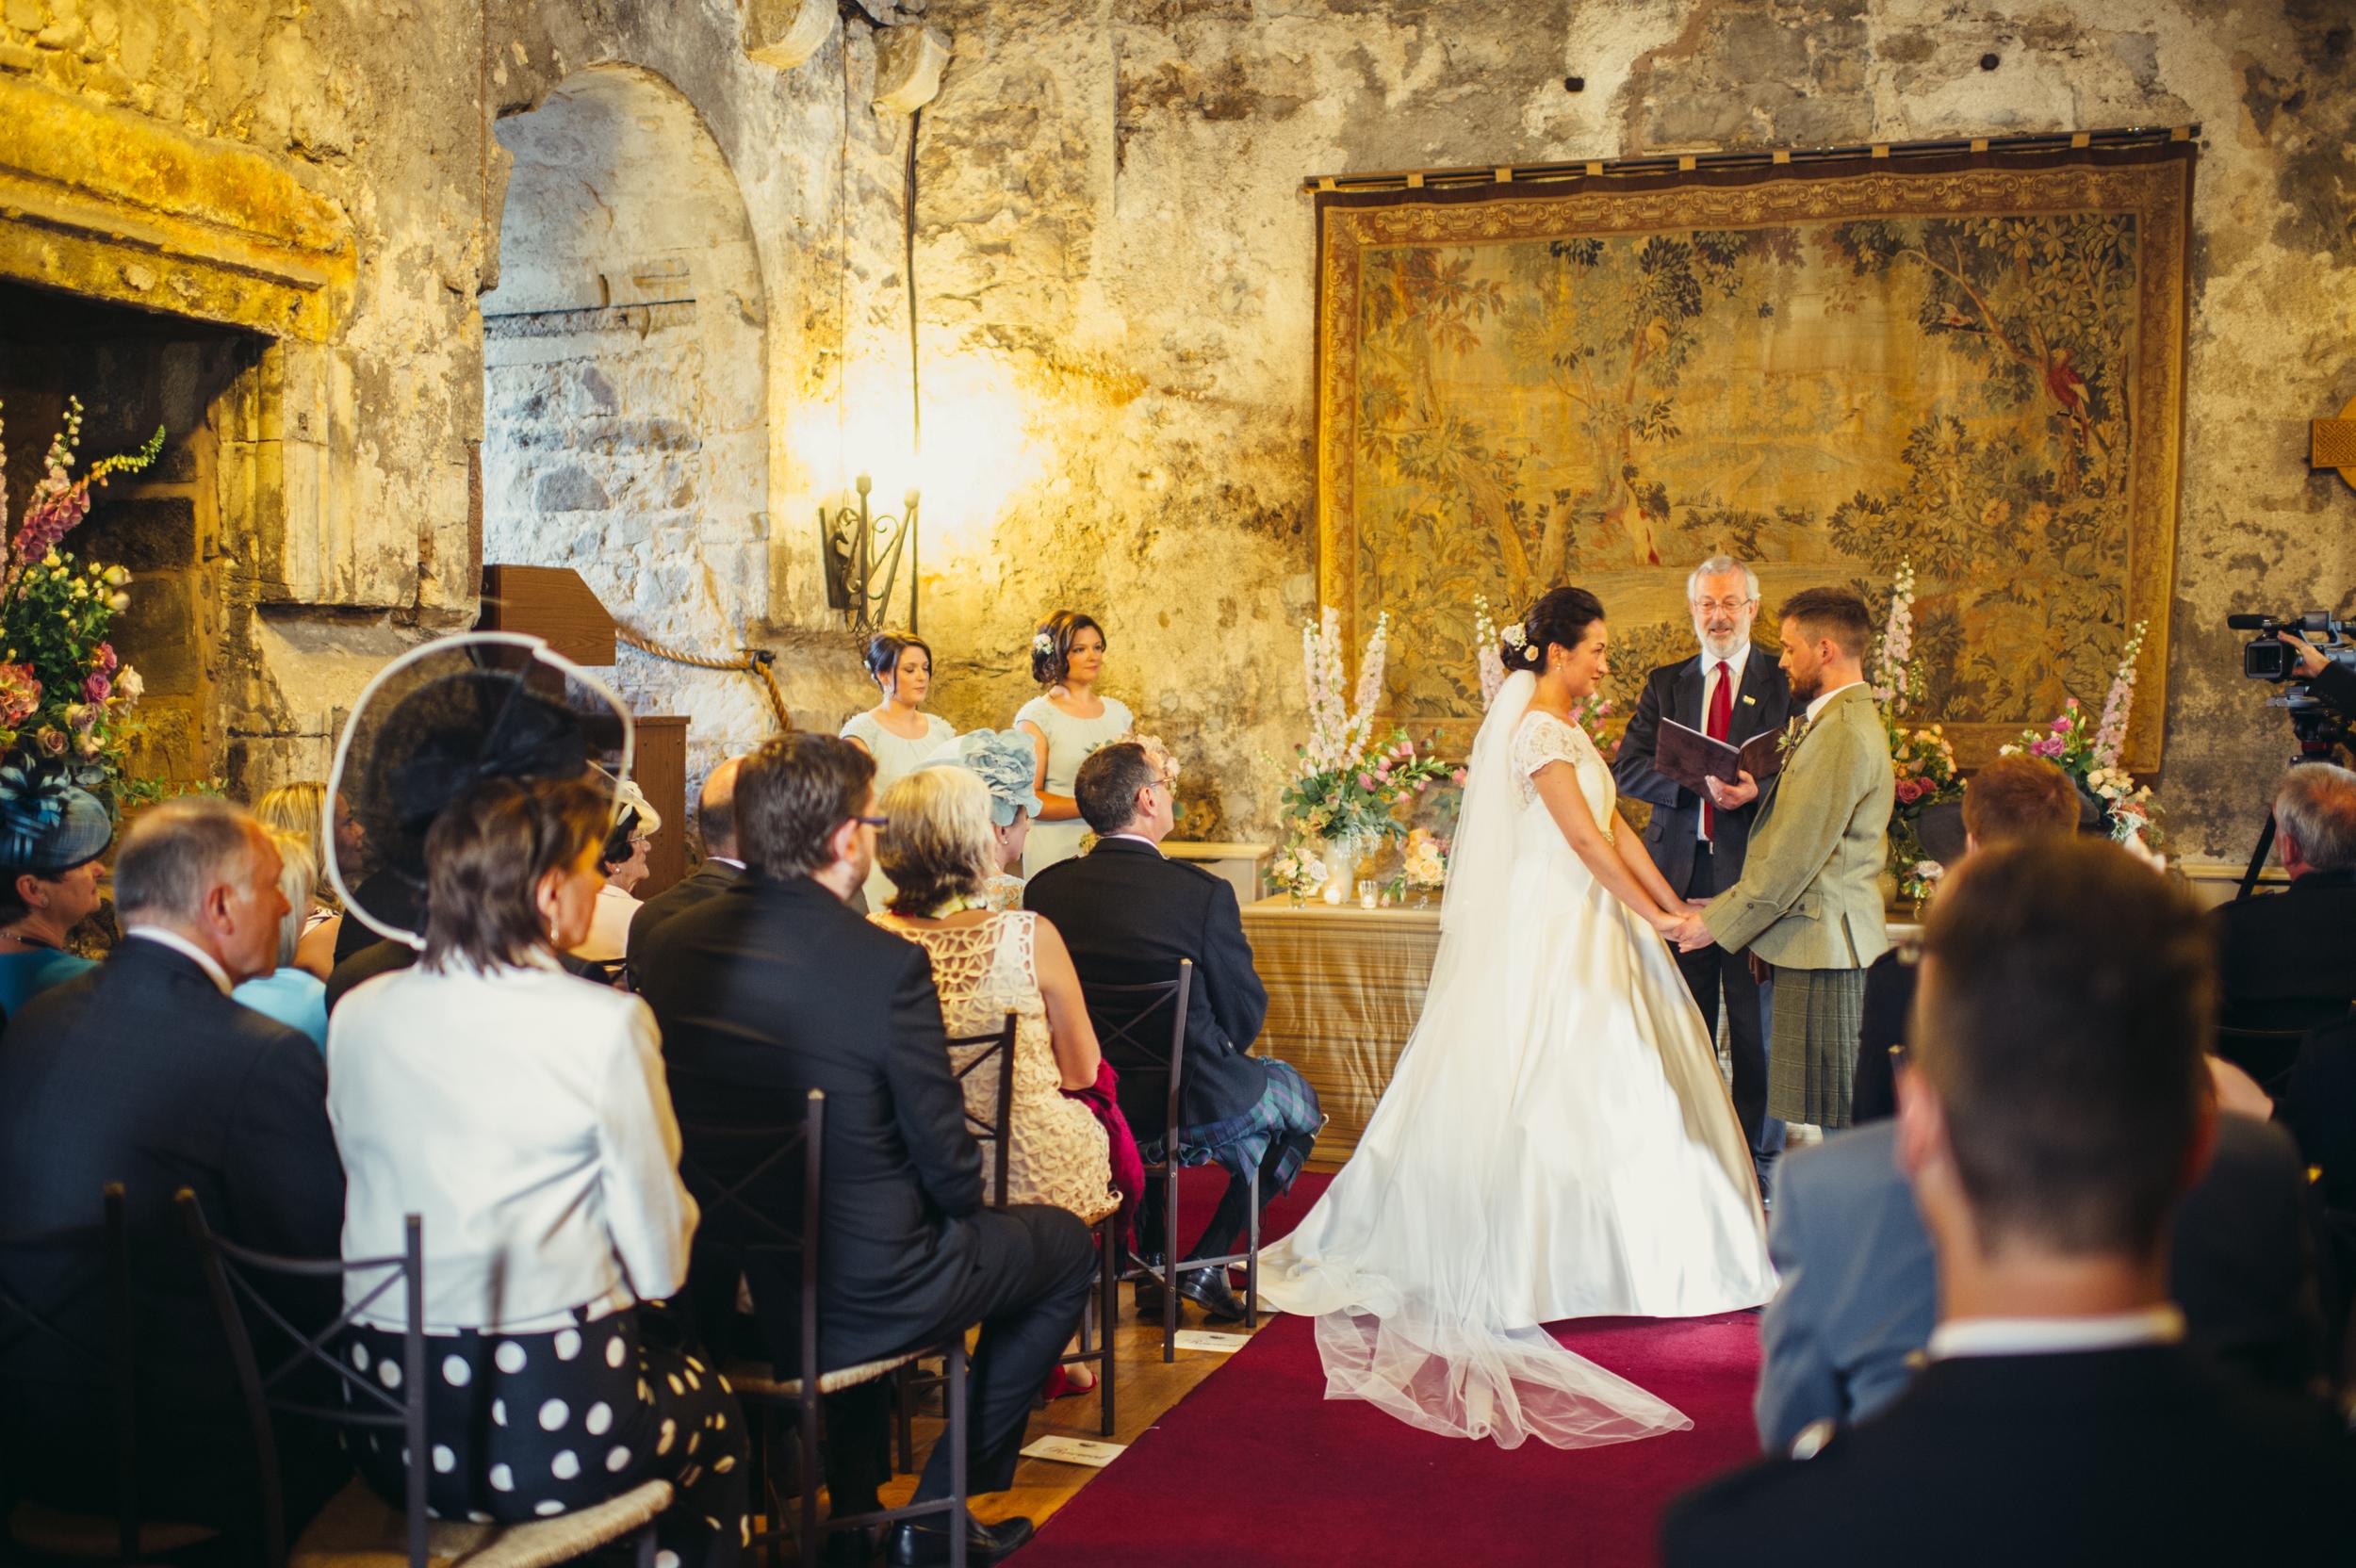 0102-lisa-devine-alternative-creative-wedding-photography-glasgow-edinburgh.JPG